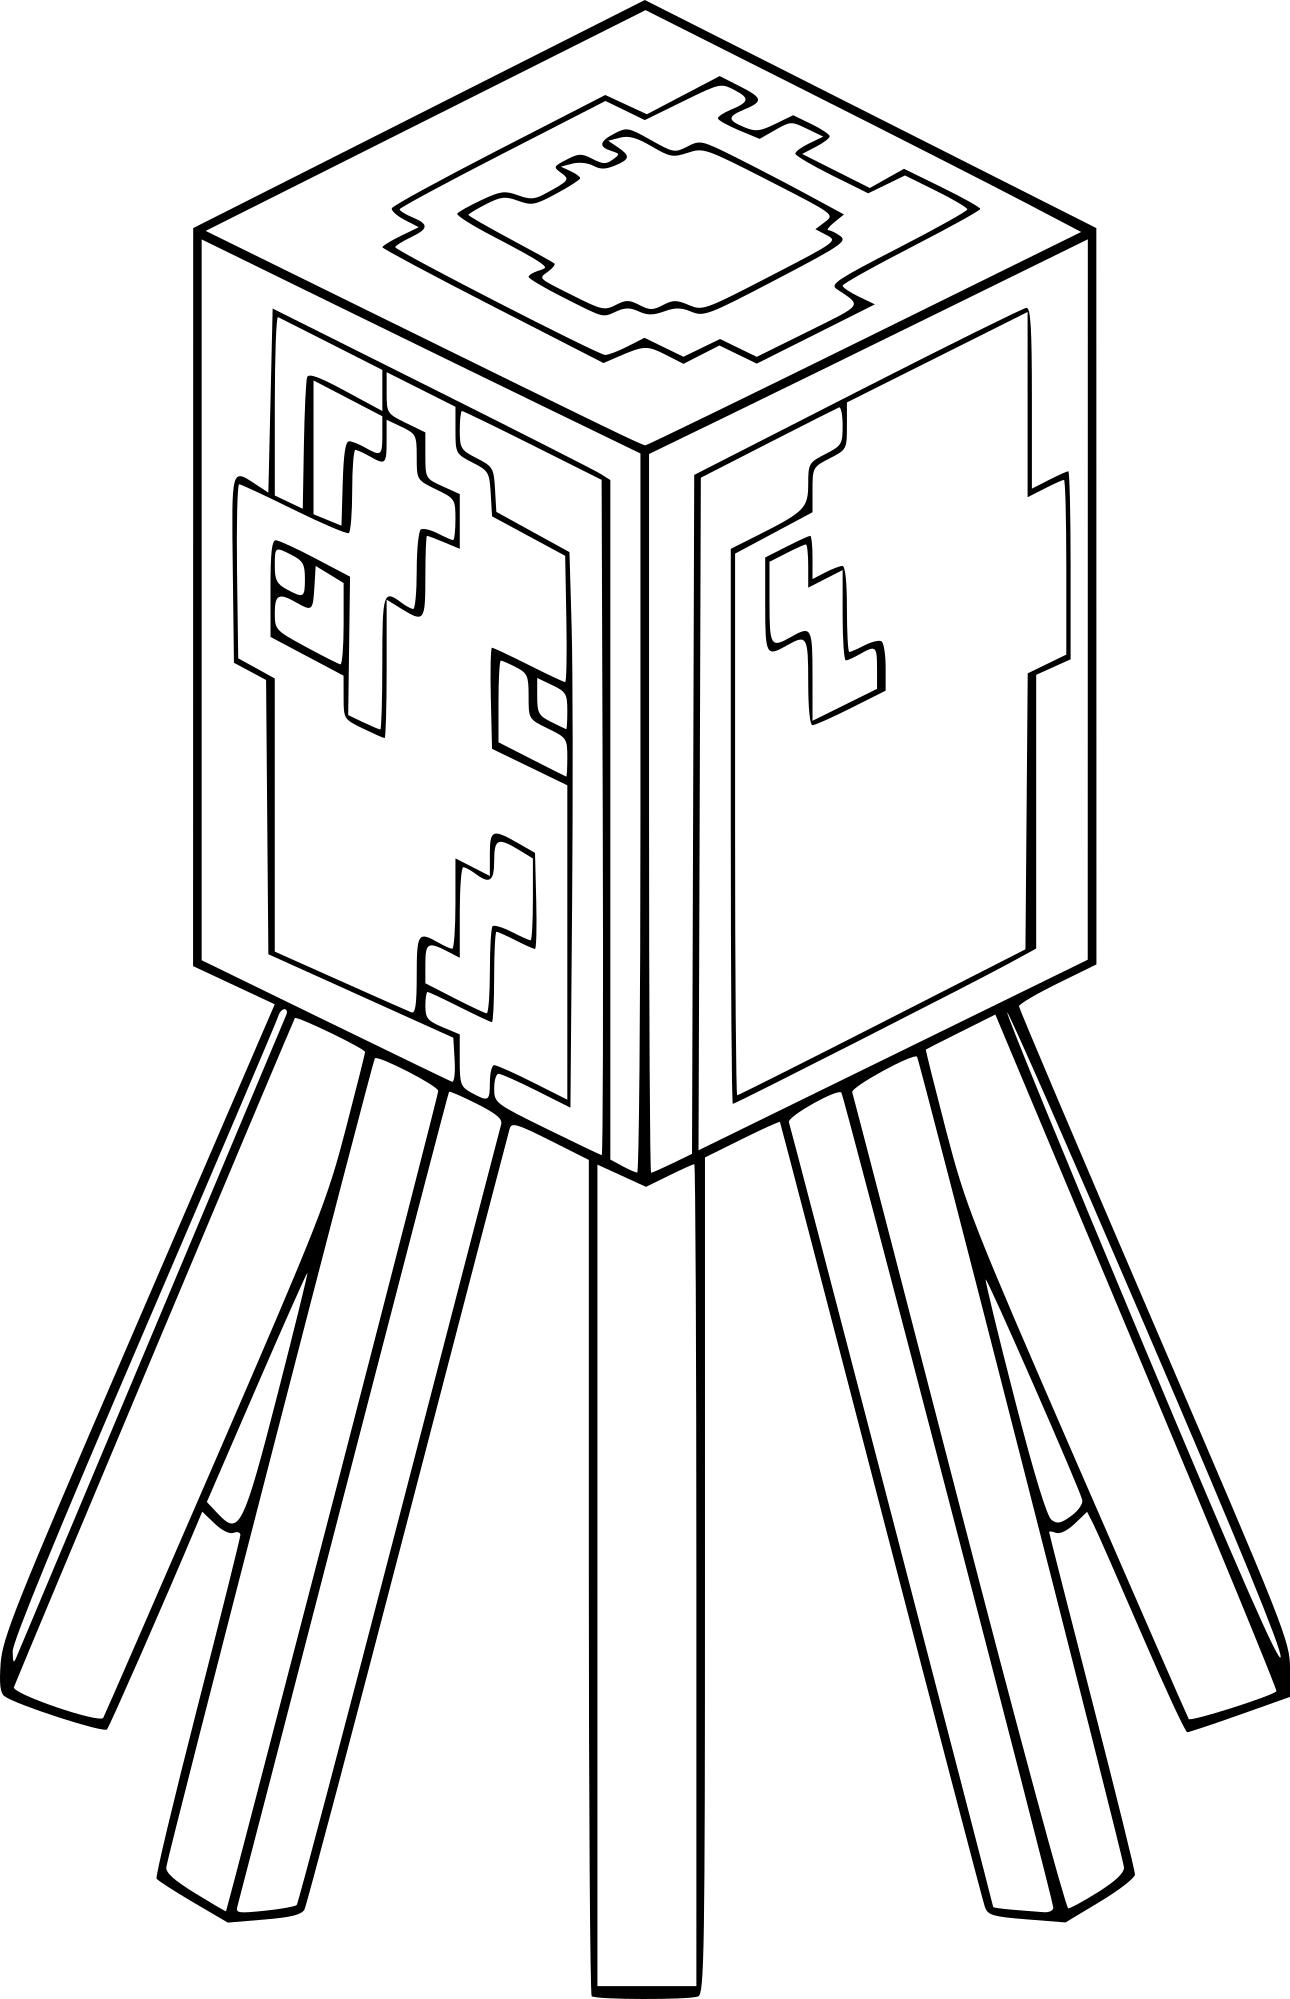 Coloriage Pieuvre De Minecraft À Imprimer concernant Coloriage Minecraft